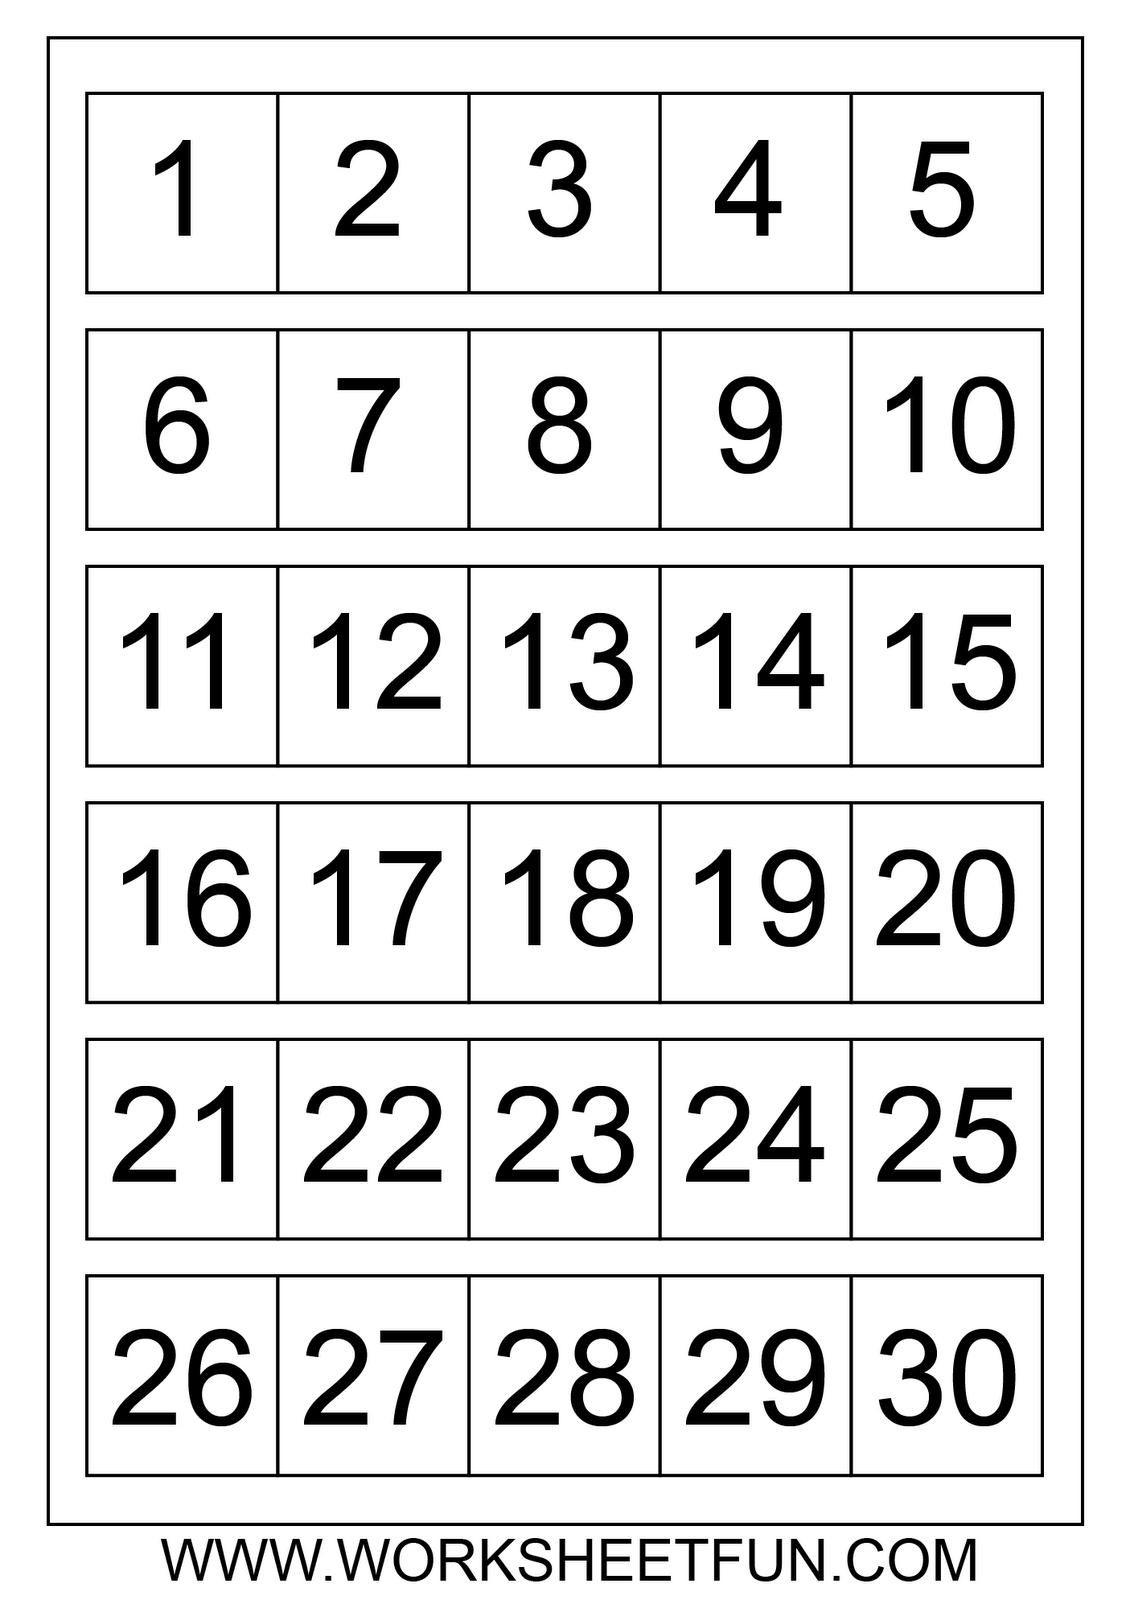 Free Printable Calendar Numbers 1 31 Pdf | Ten Free Calendar Numbers Printable 1 31